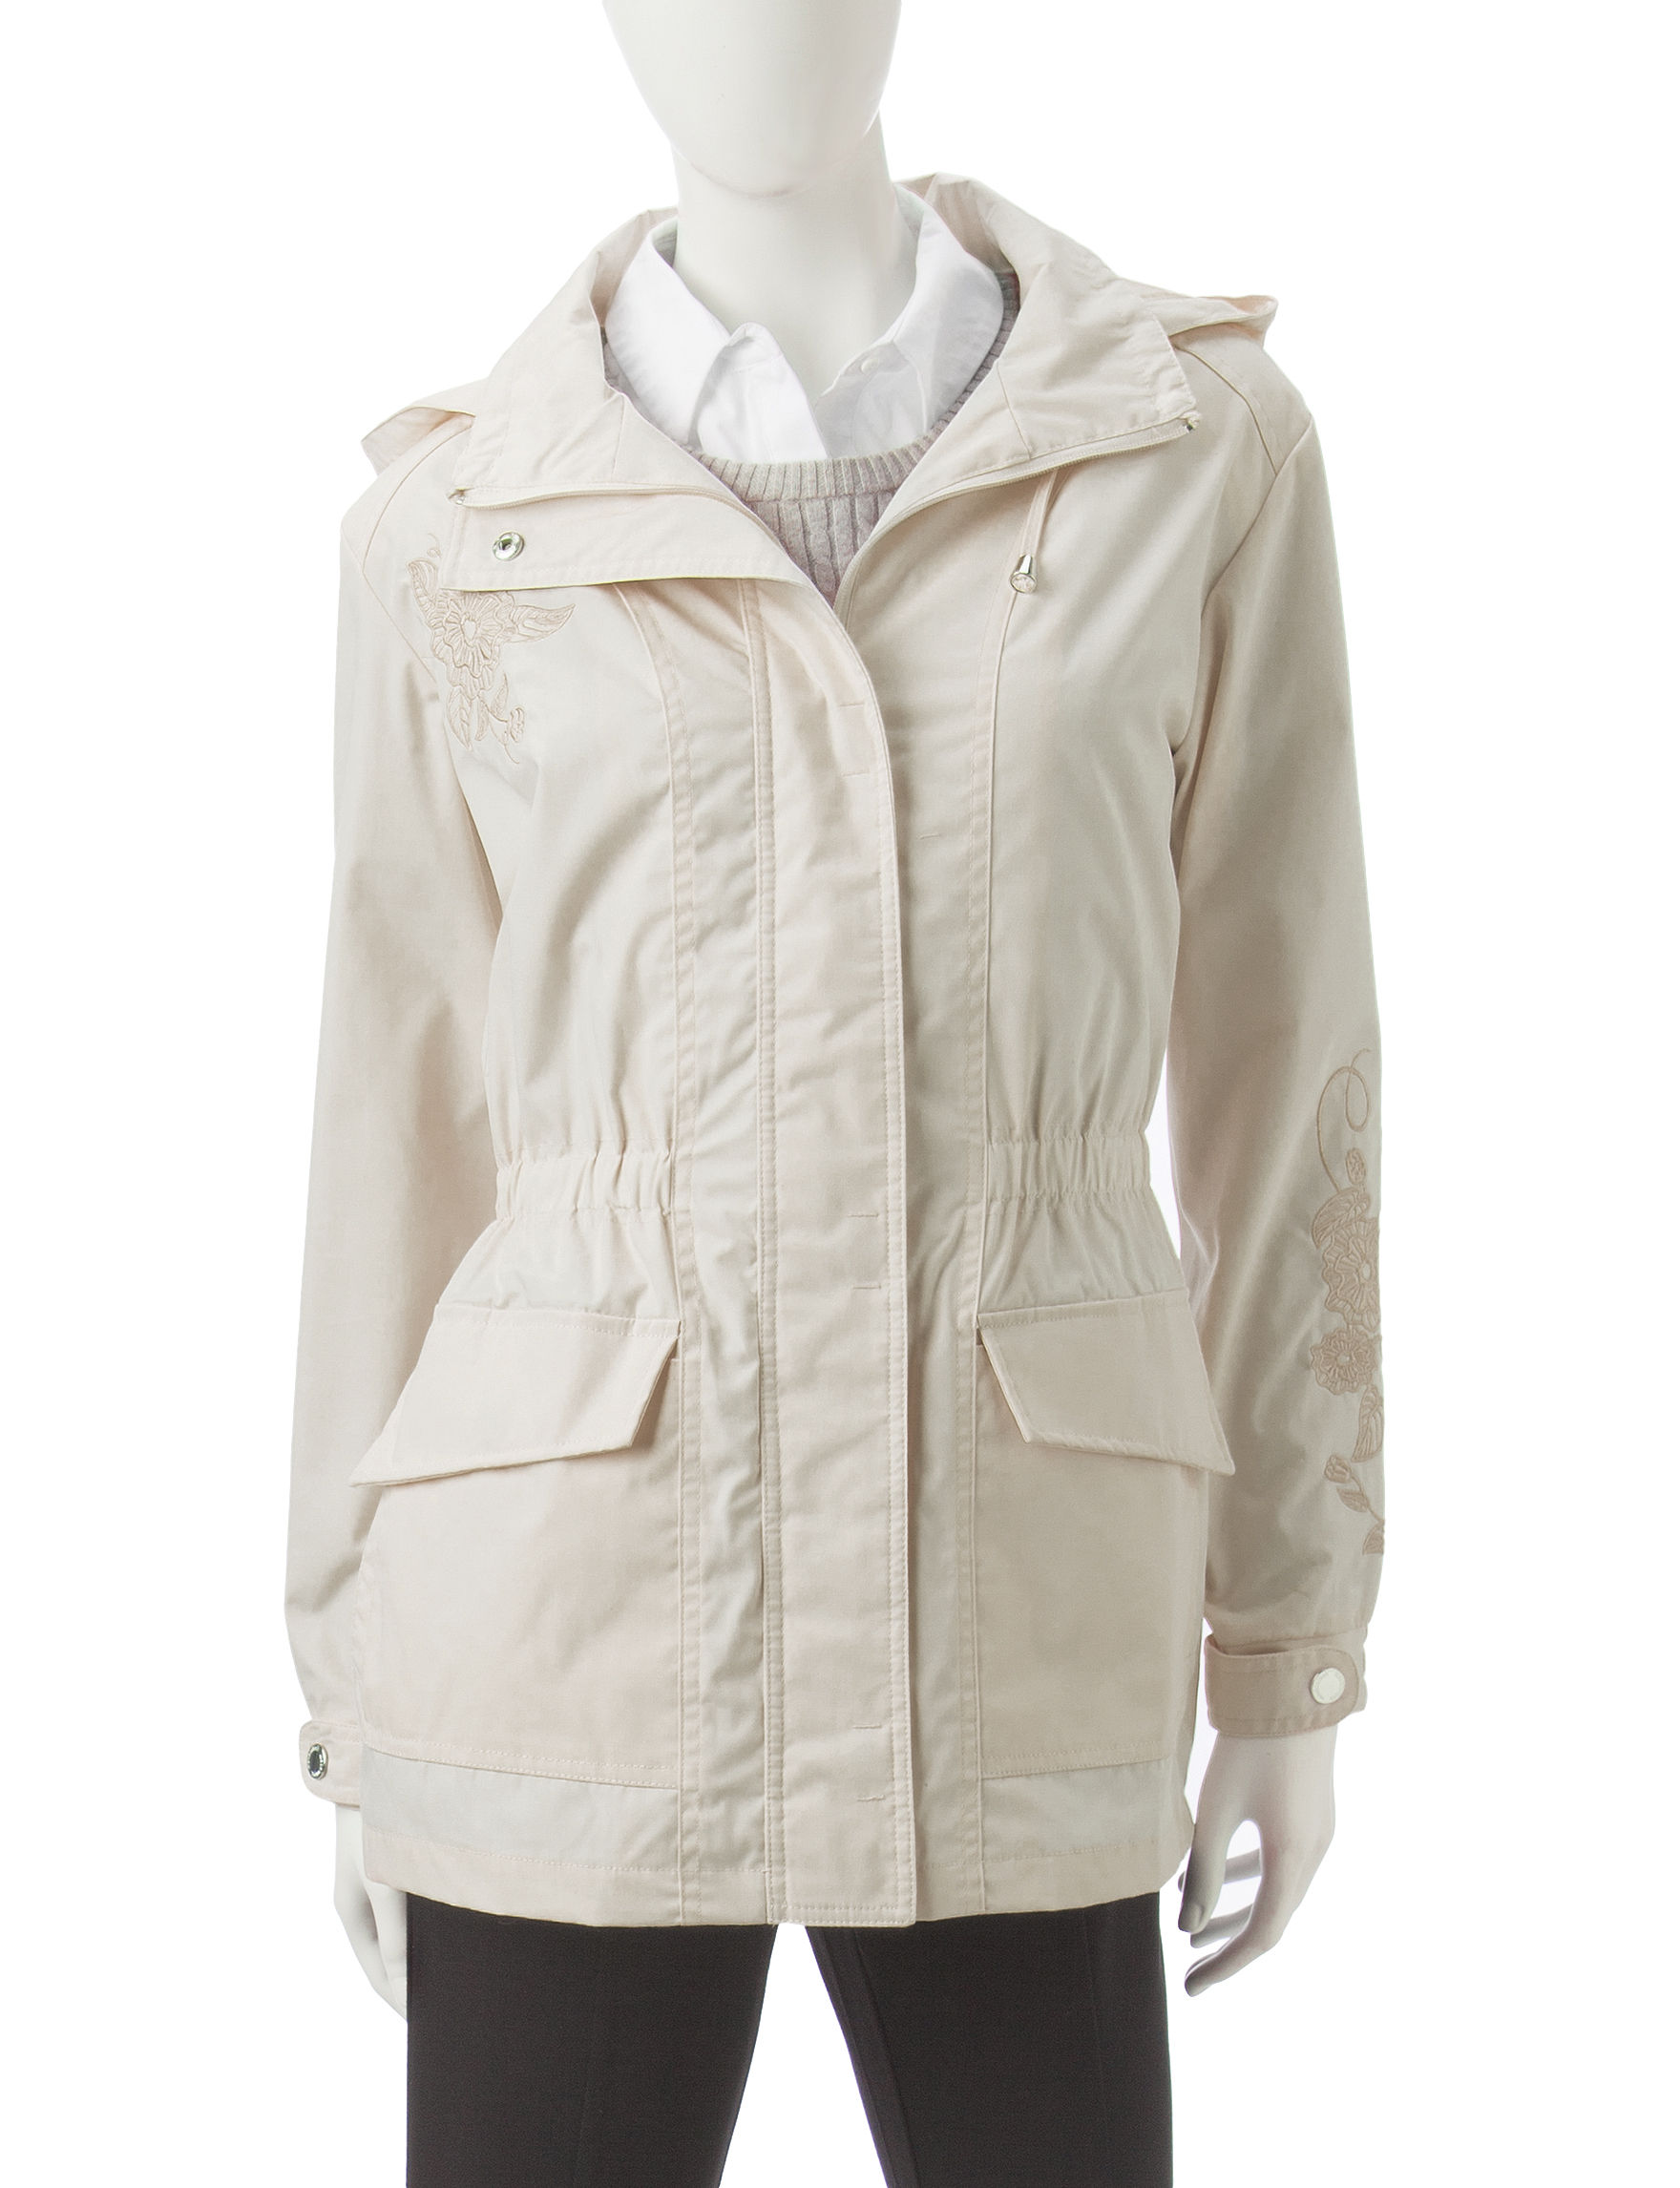 Mackintosh Tan Rain & Snow Jackets